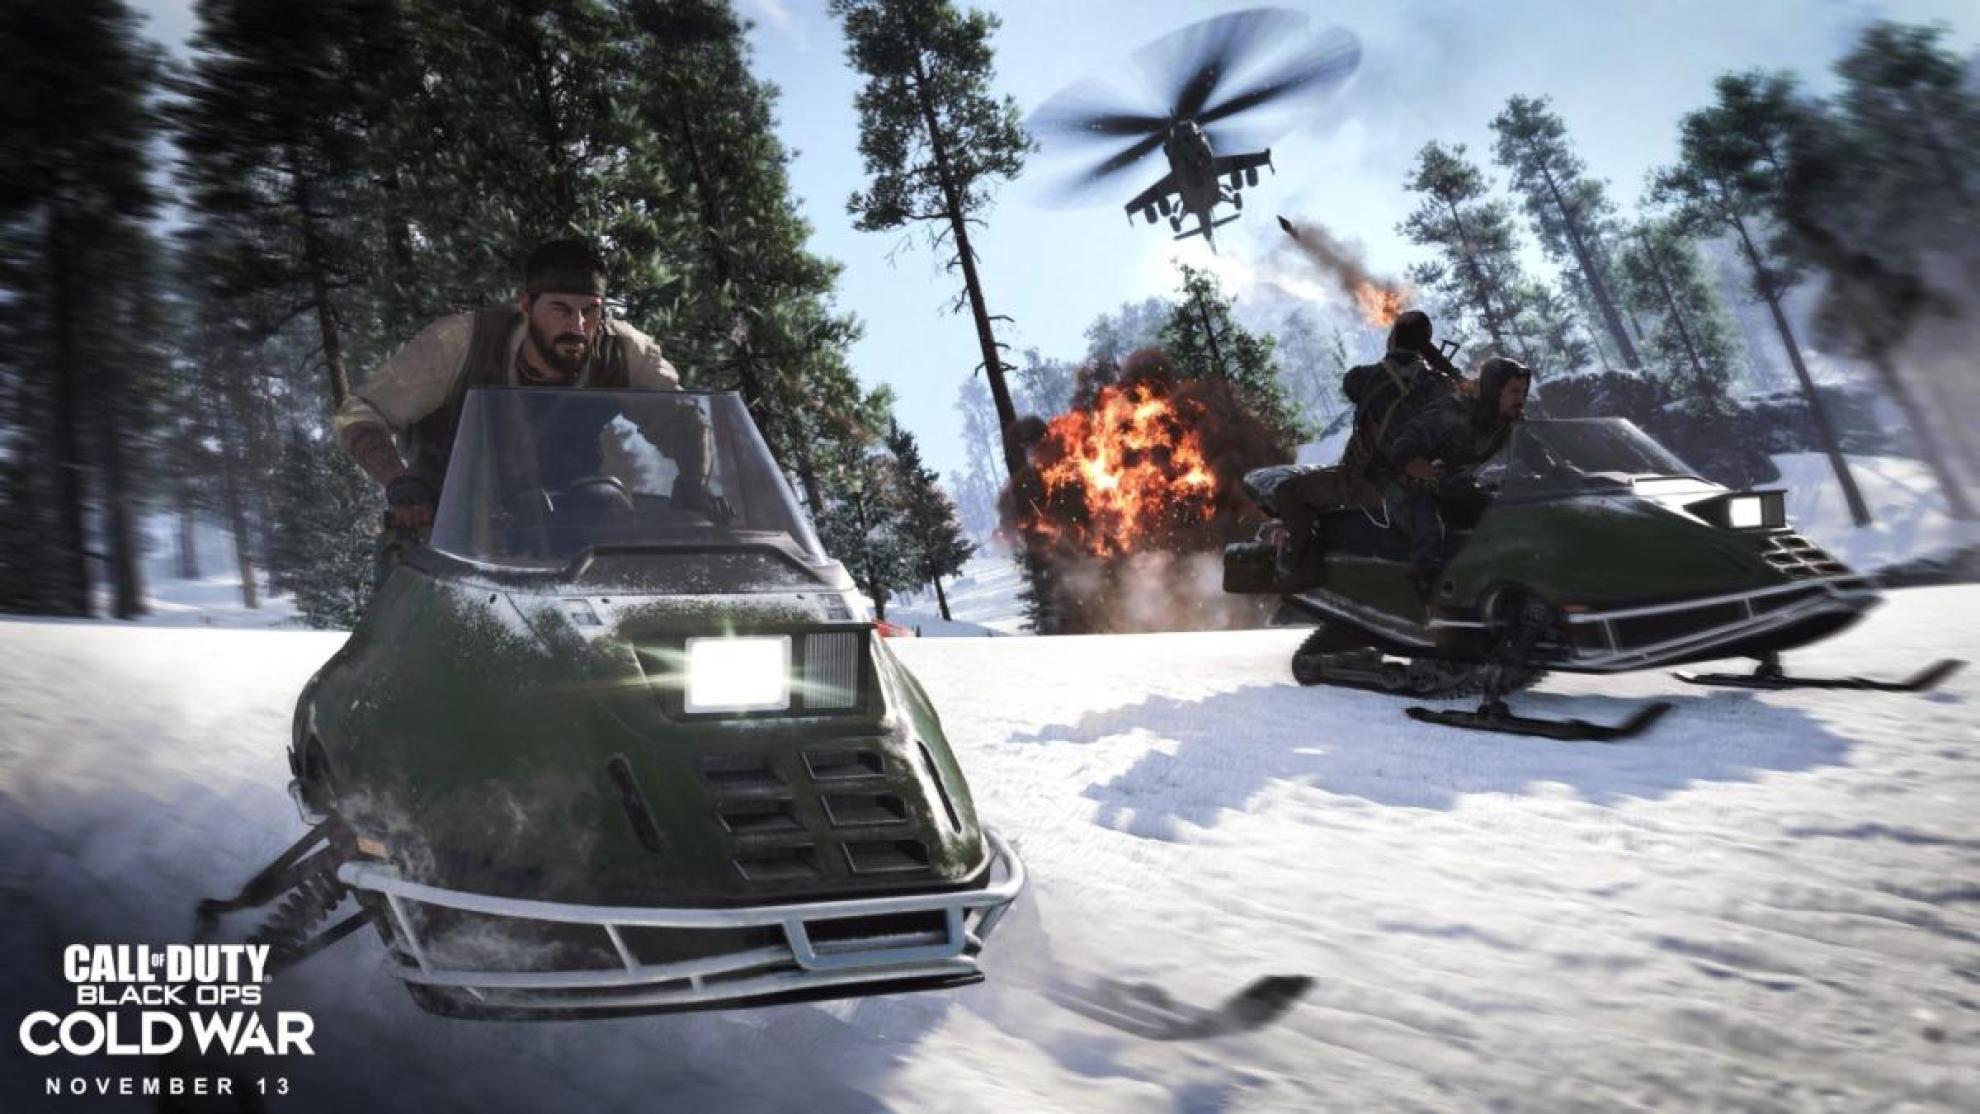 CoD:BOCW:『コール オブ デューティ ブラックオプス コールドウォー』PS5/PS4/Xbox Series X/Xbox One/PC版が本日発売